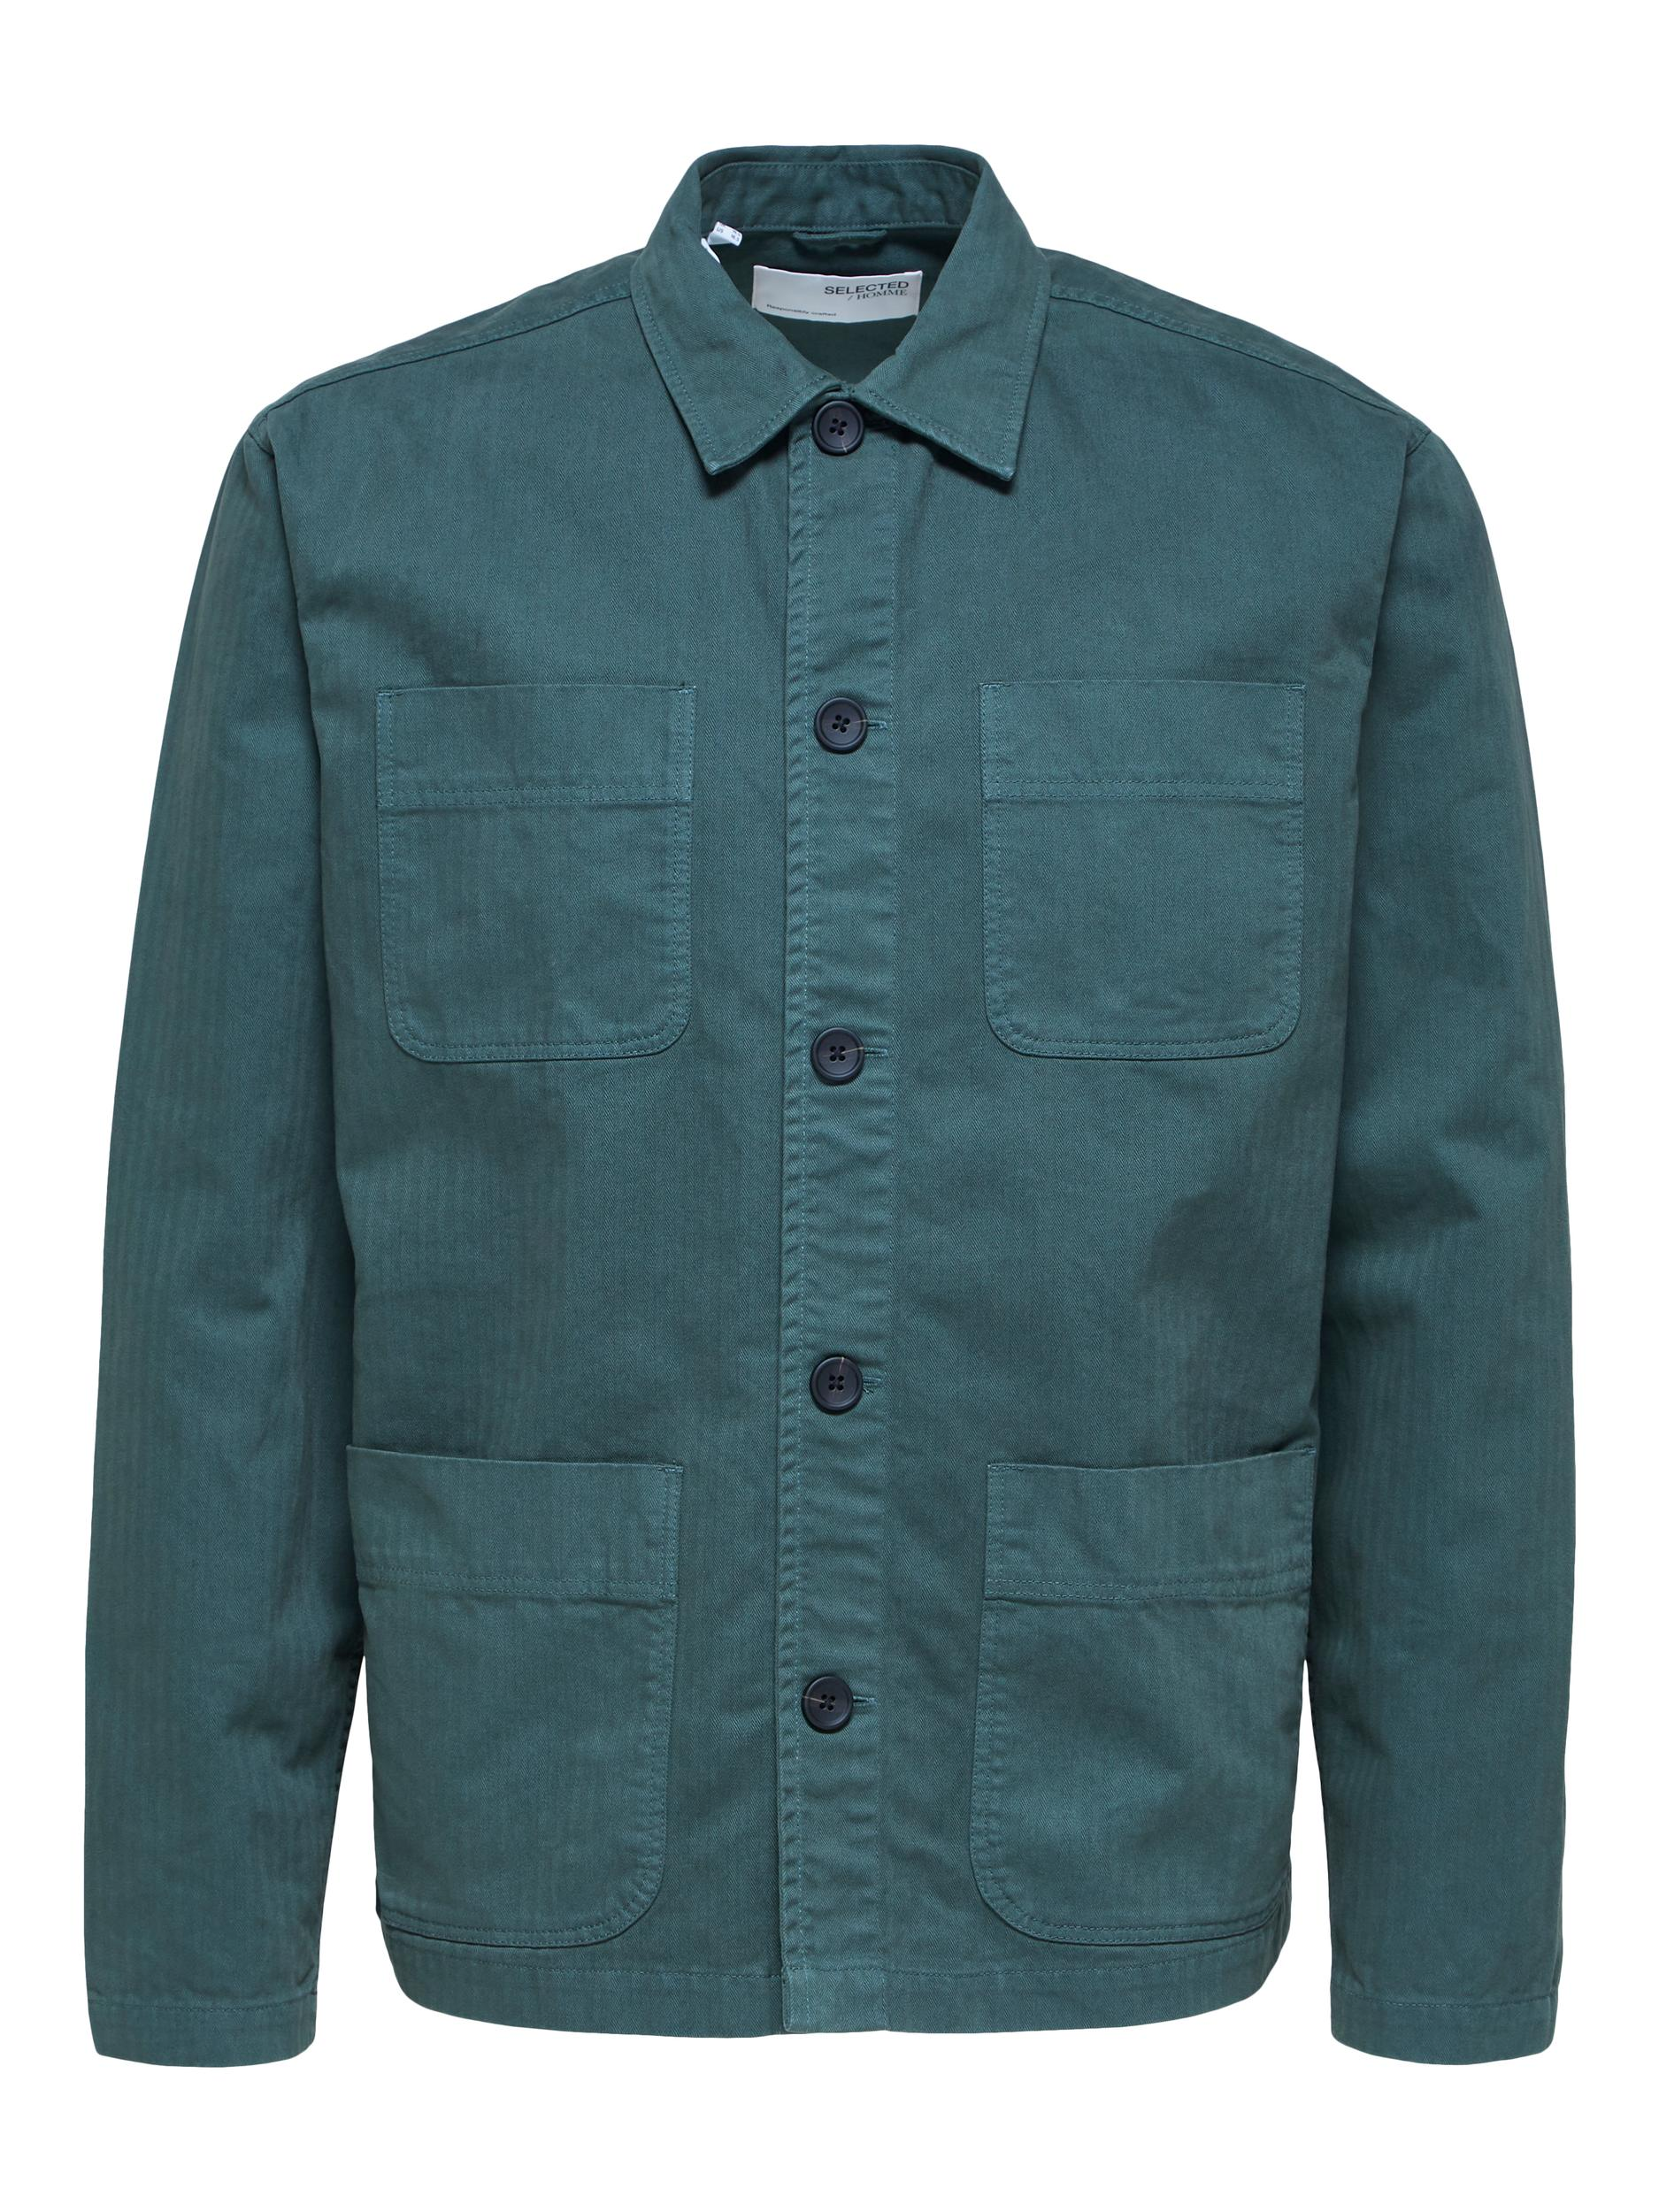 Selected Homme Loose Tony overshirt, darkest spruce, large